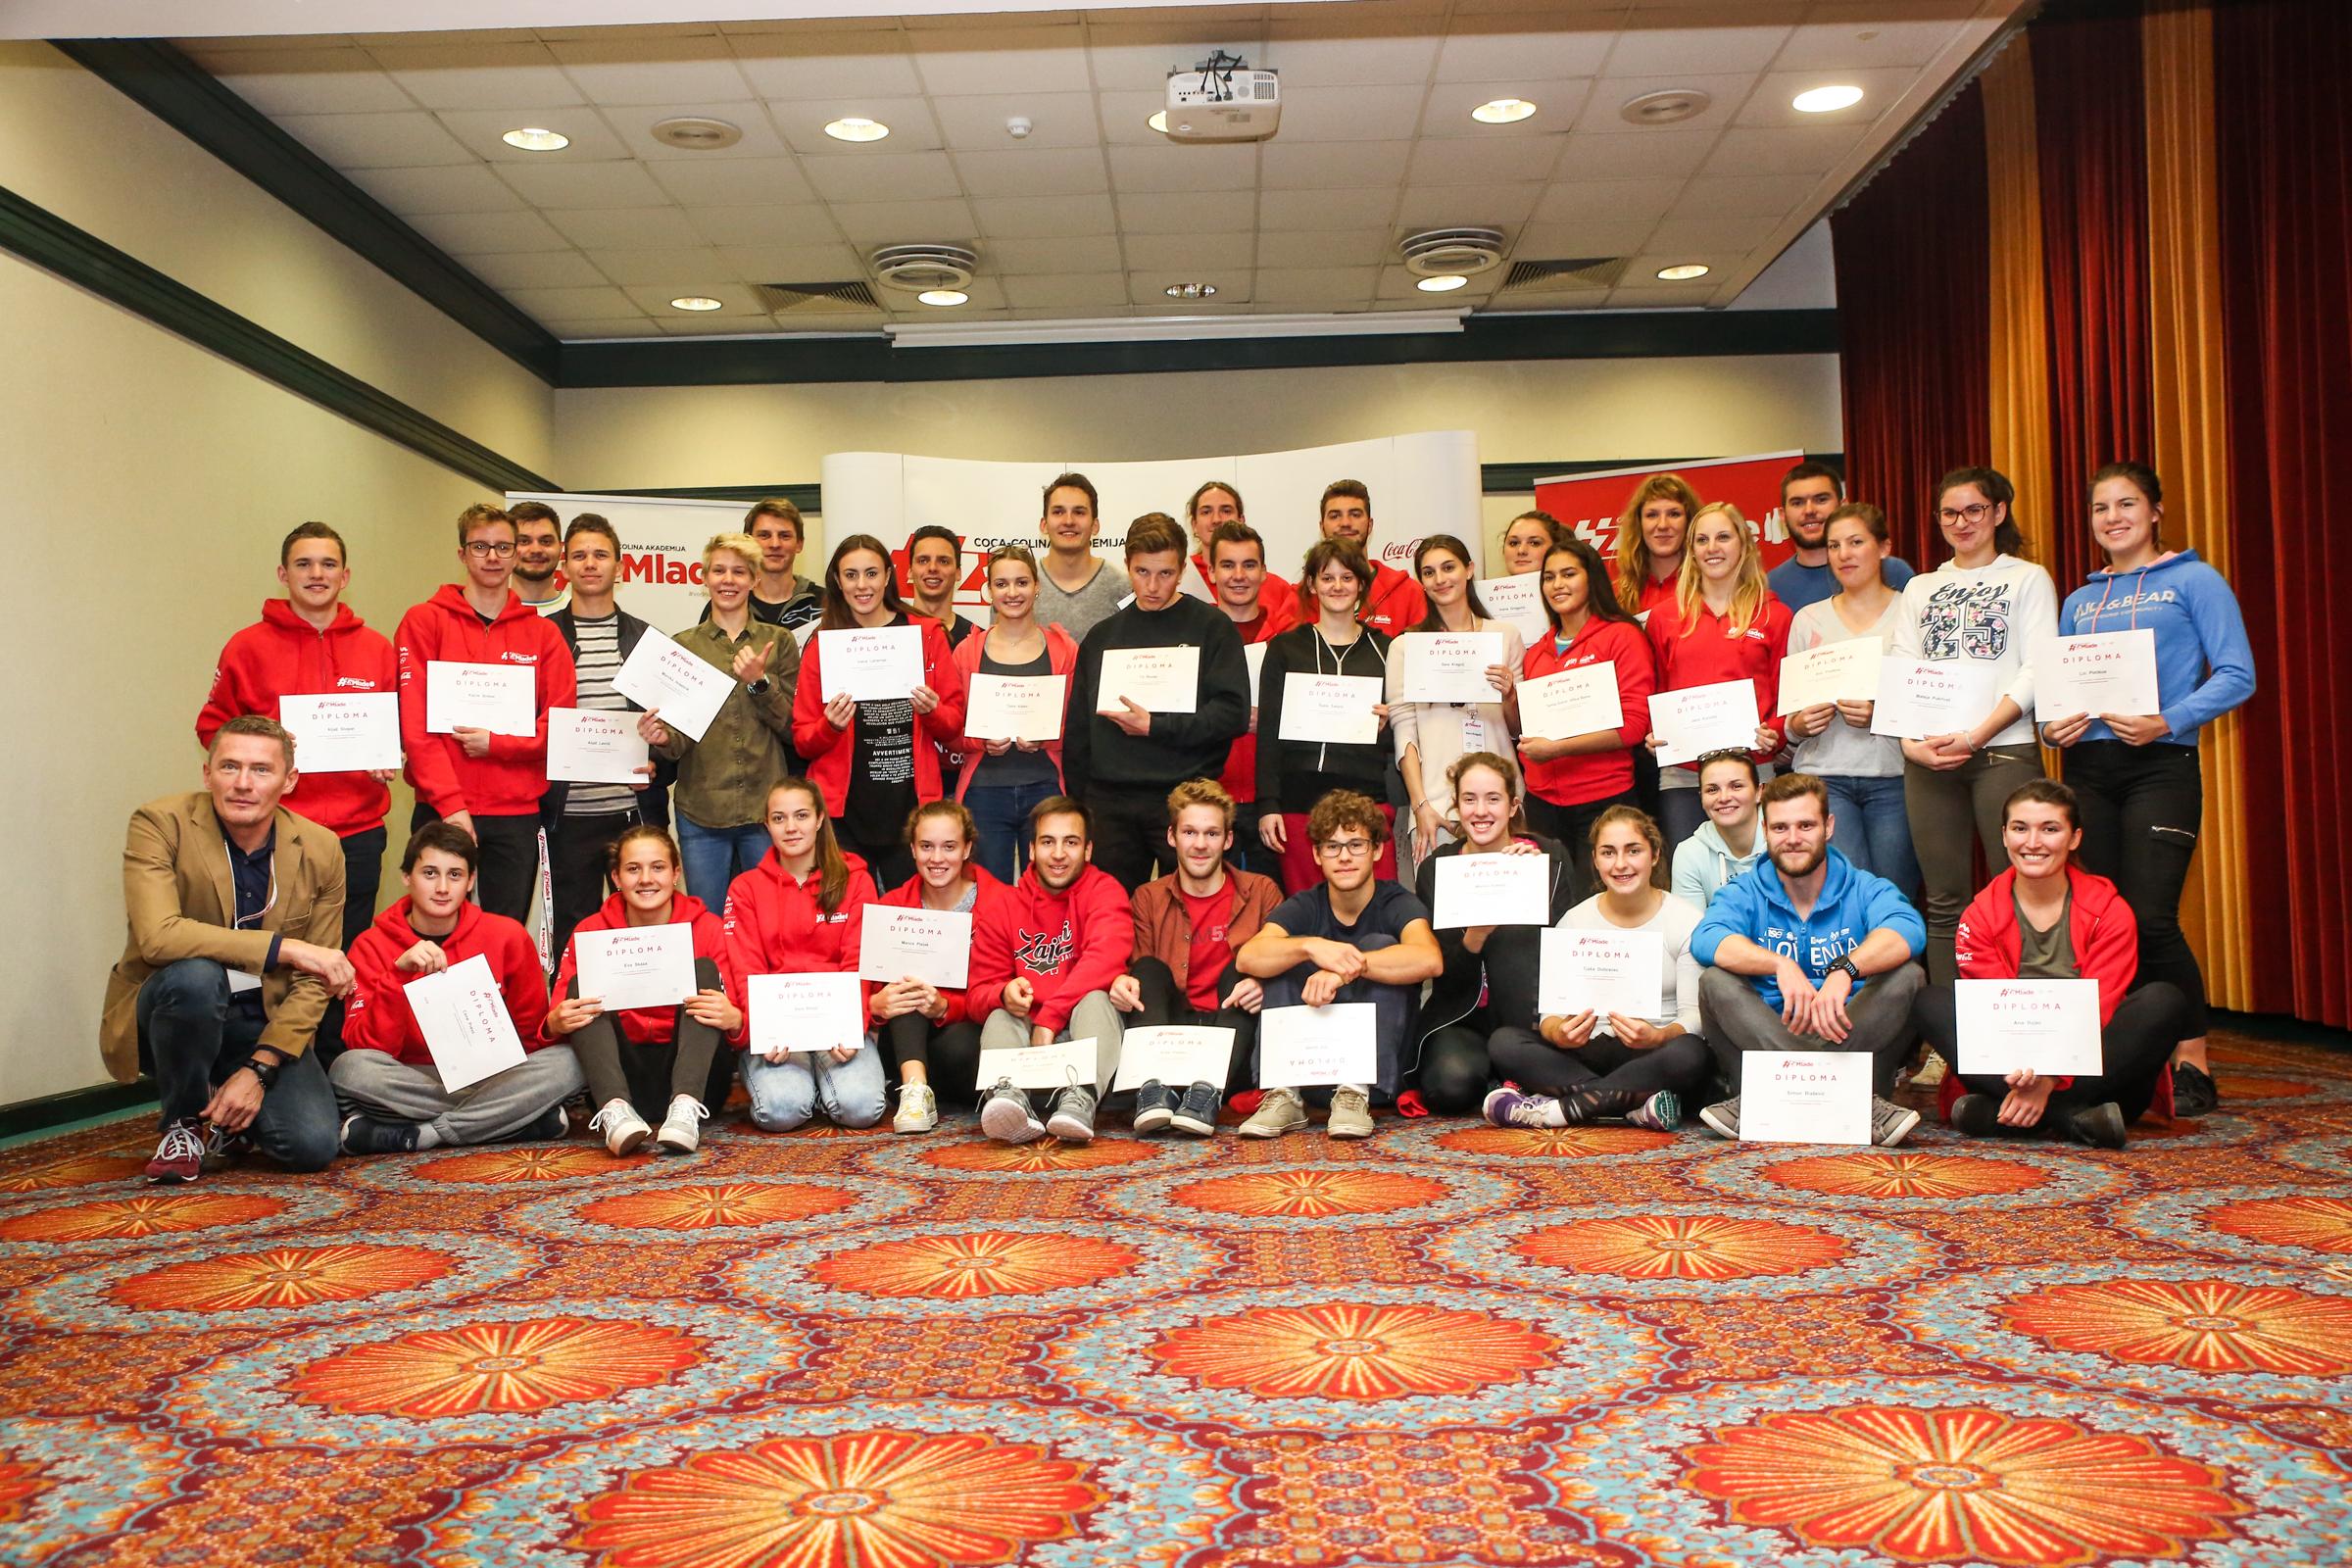 Akademija za mlade – podpora športnikom pri razvoju njihove dvojne kariere